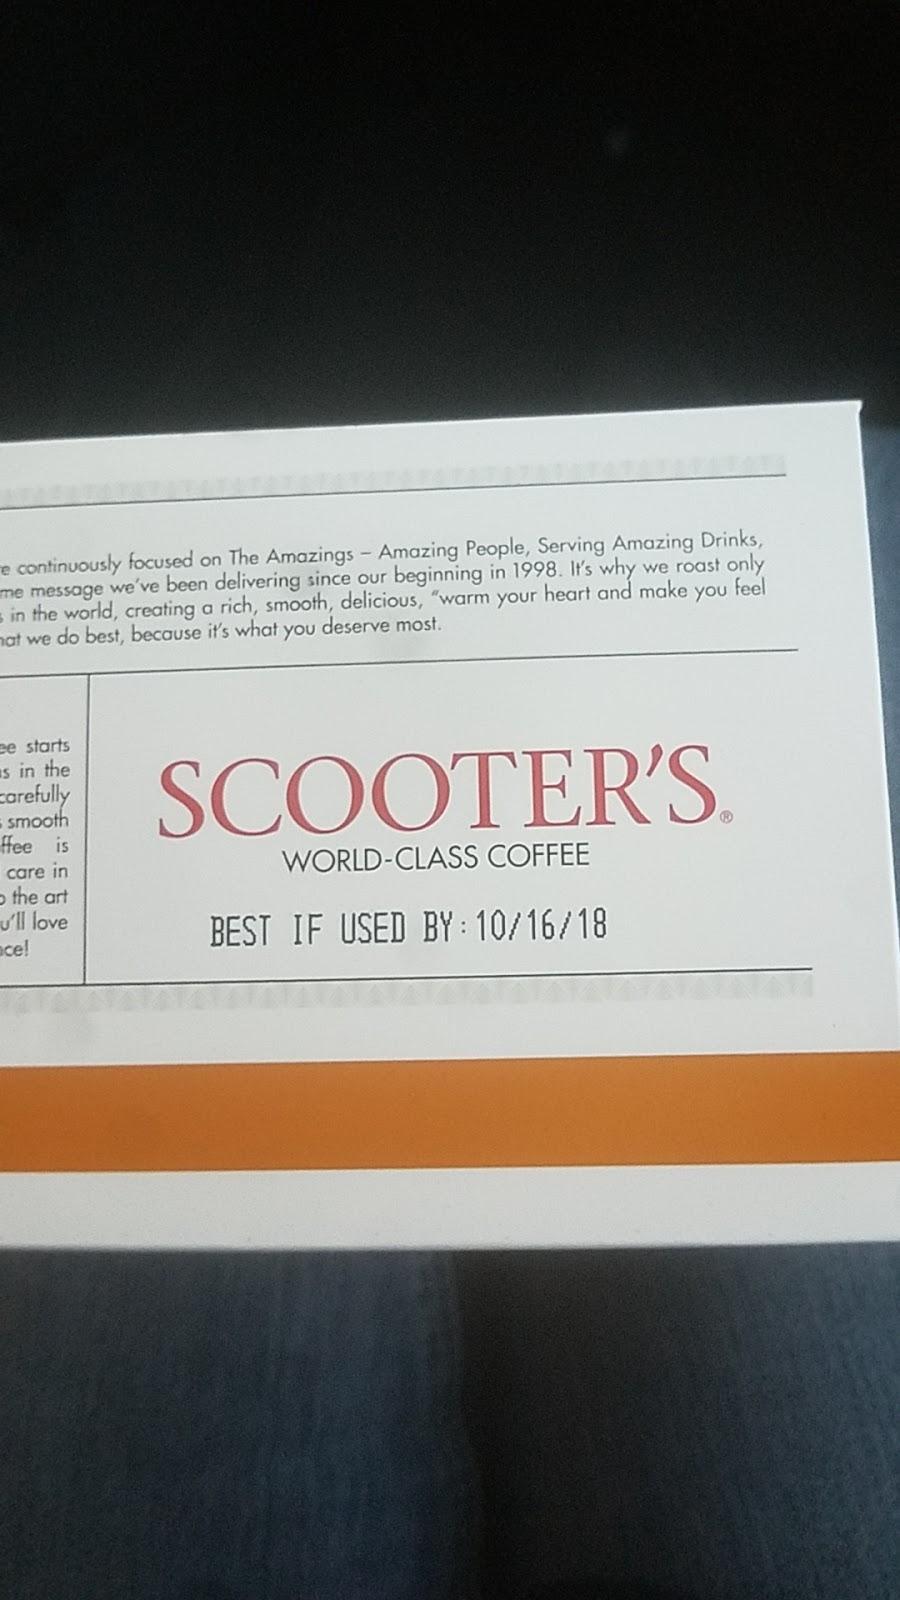 Scooters Coffee - bakery  | Photo 7 of 10 | Address: Cornhusker Plaza, 2402 Cornhusker Rd, Bellevue, NE 68123, USA | Phone: (402) 916-1966